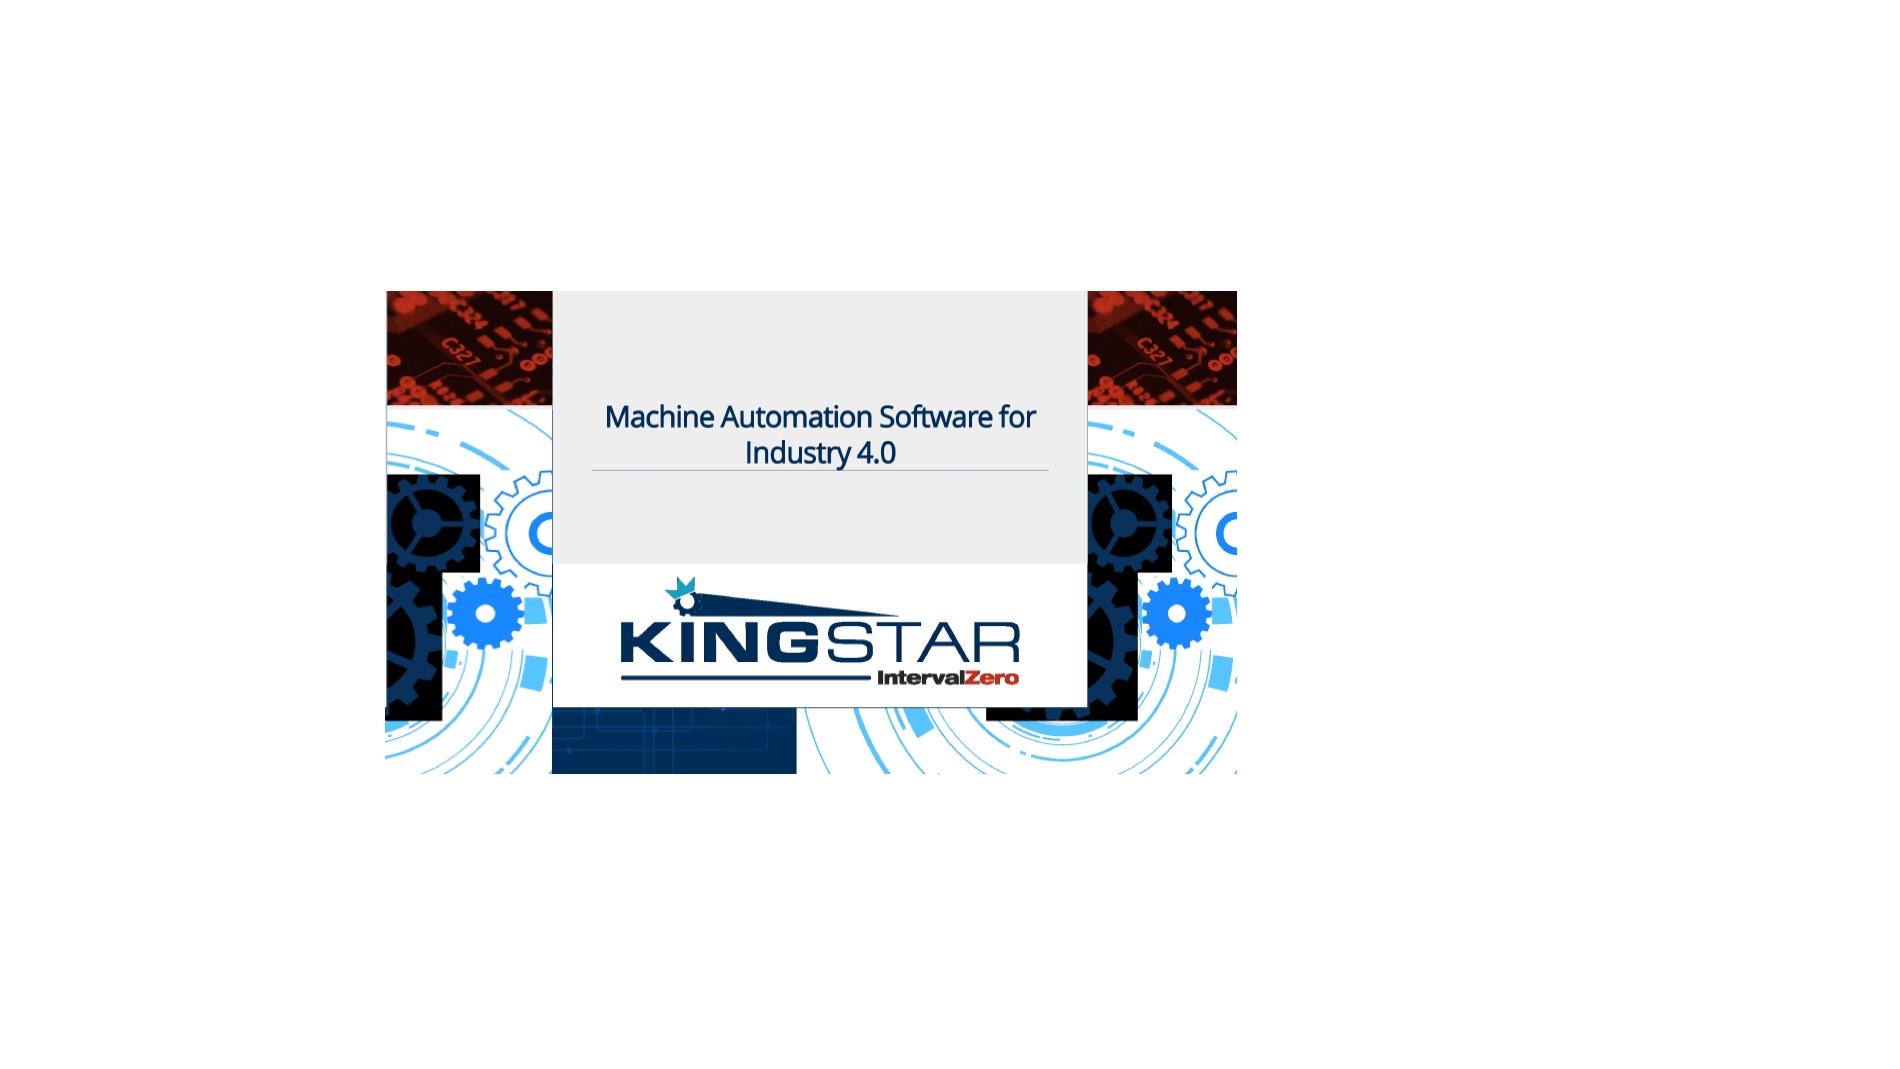 IntervalZero - KingStar, da IPC a PAC Motion: webinar breve